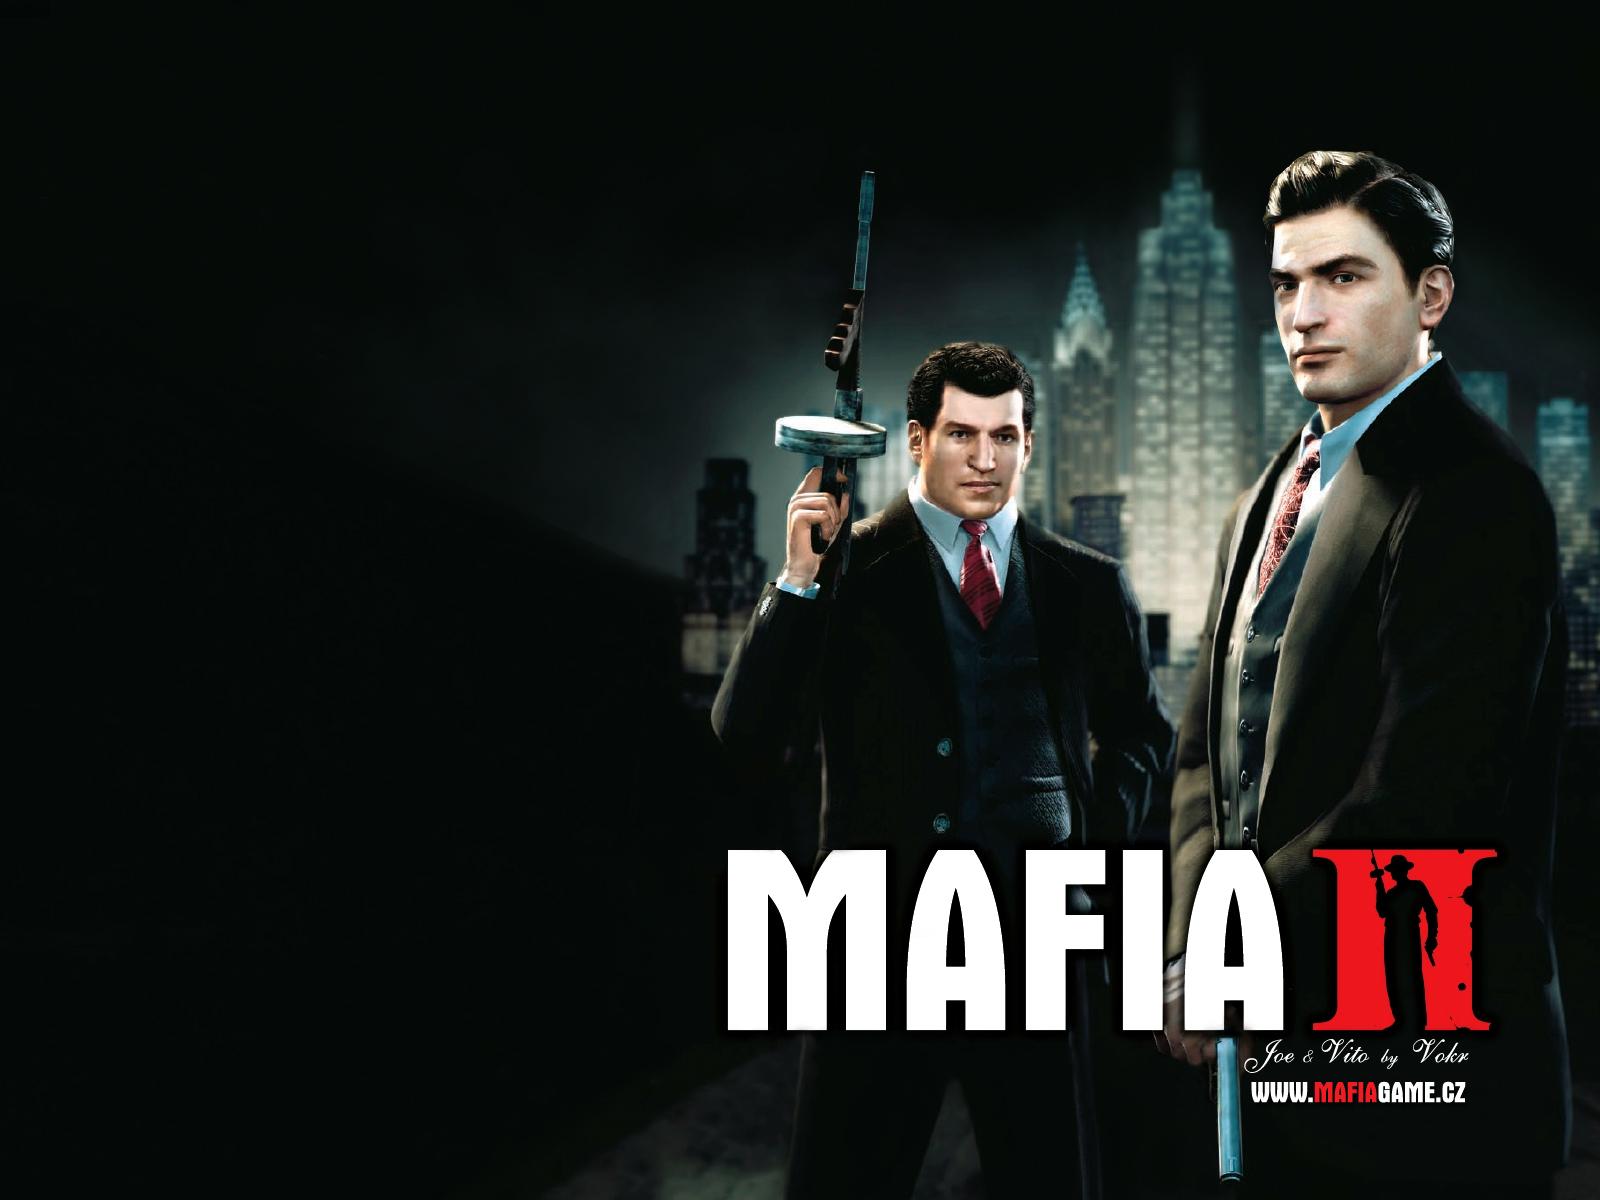 49 Mafia 3 Wallpaper On Wallpapersafari